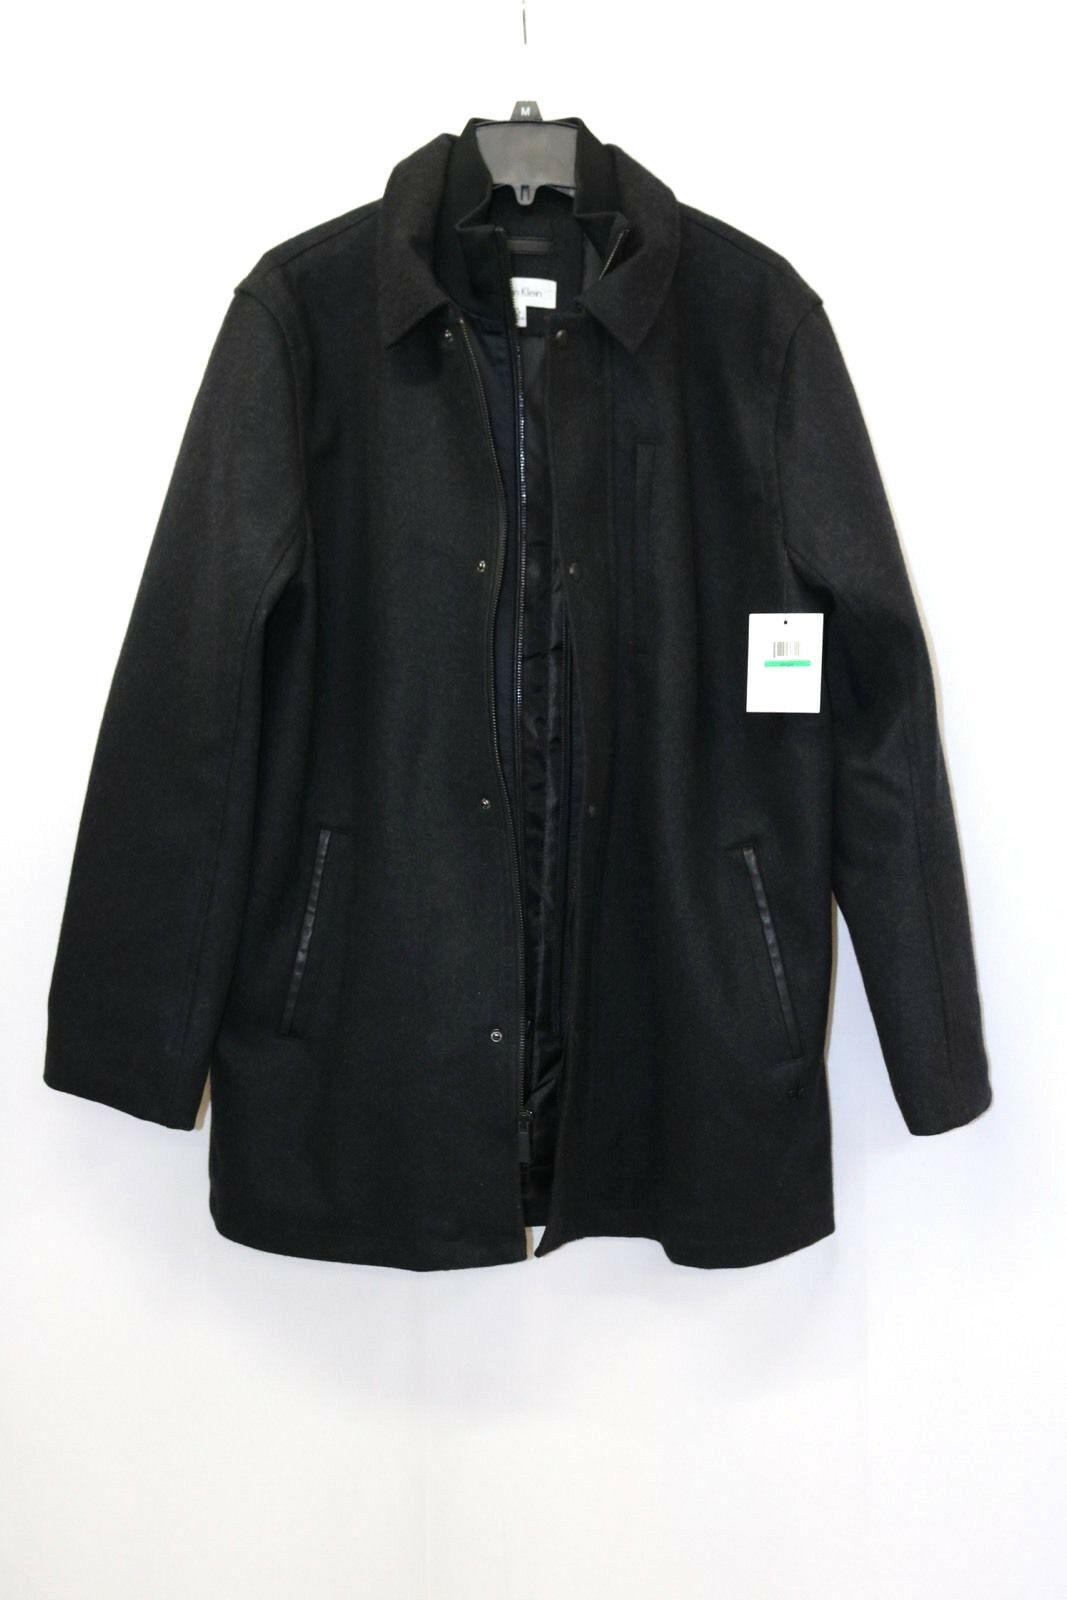 Calvin Klein Mens Jacket Wool Blend Car Coat Charcoal Size L MyAFC